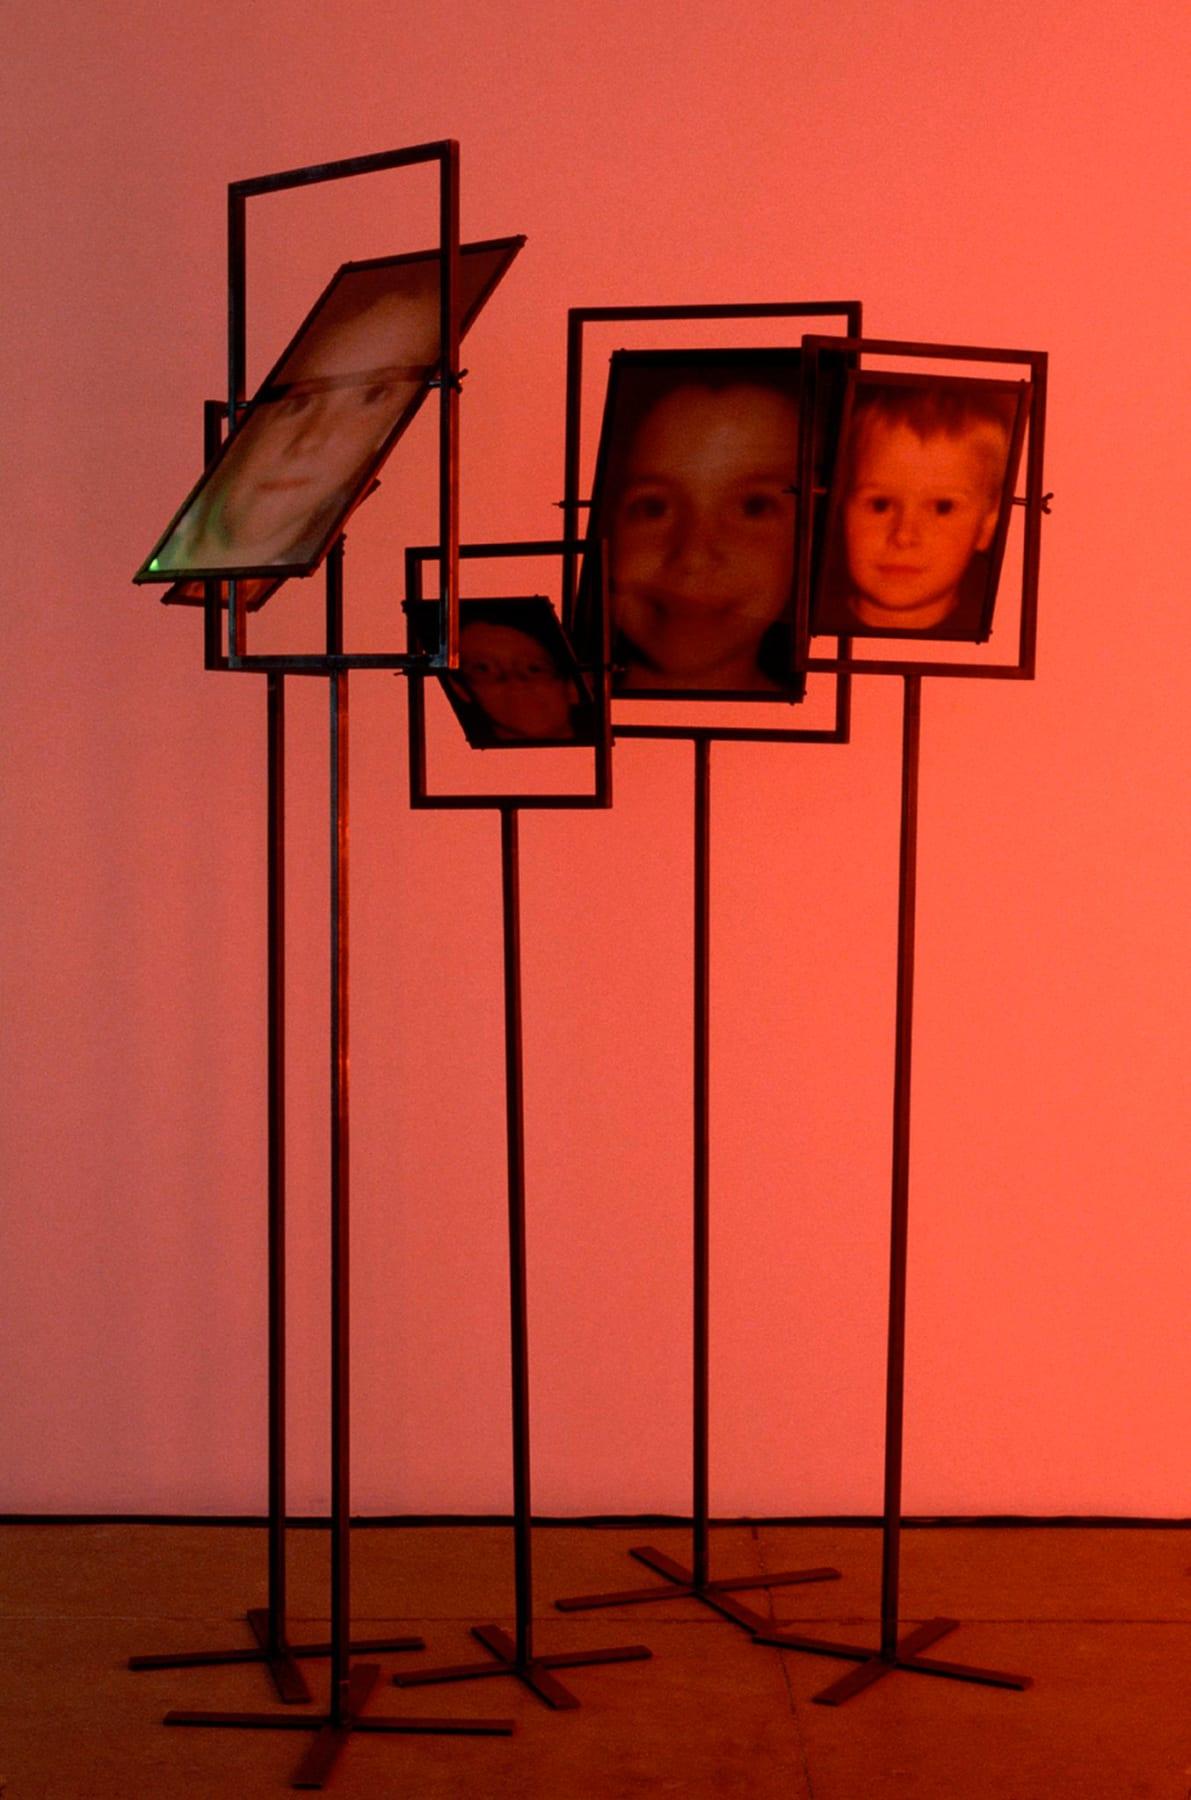 Christian Boltanski, Les Miroirs (5 photographs), 2000